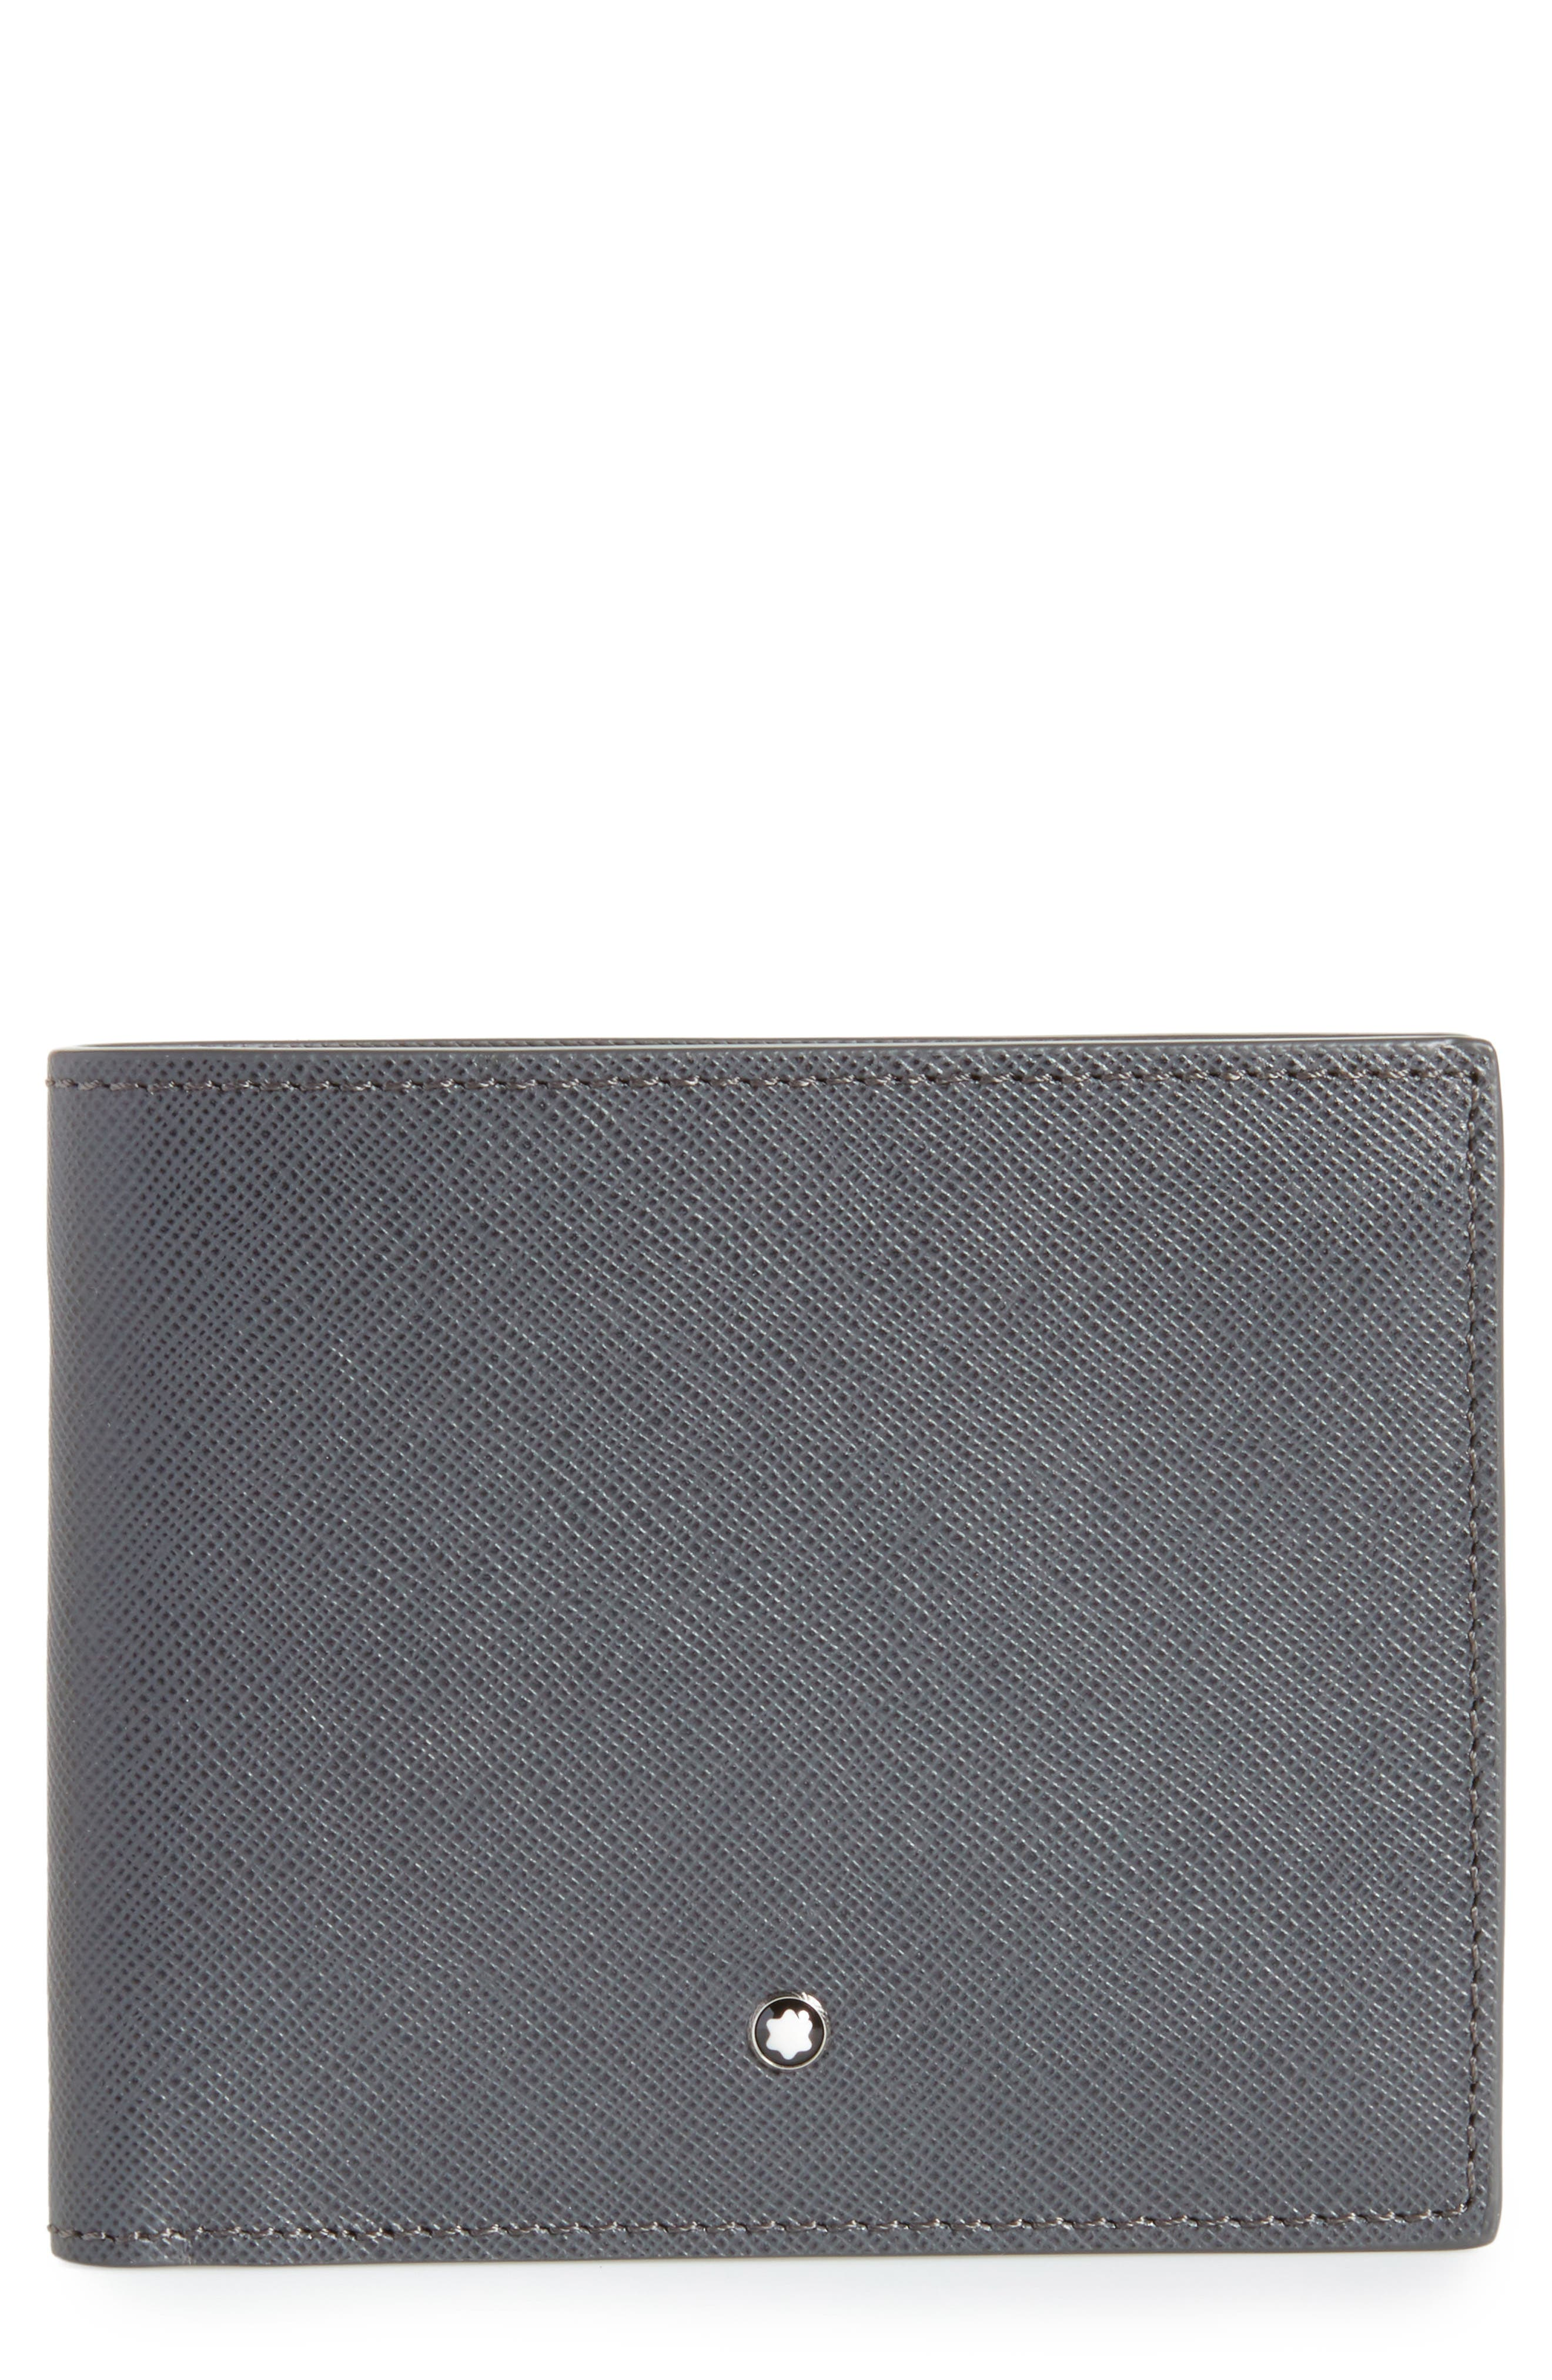 Sartorial Leather Bifold Wallet,                             Main thumbnail 1, color,                             DARK GREY